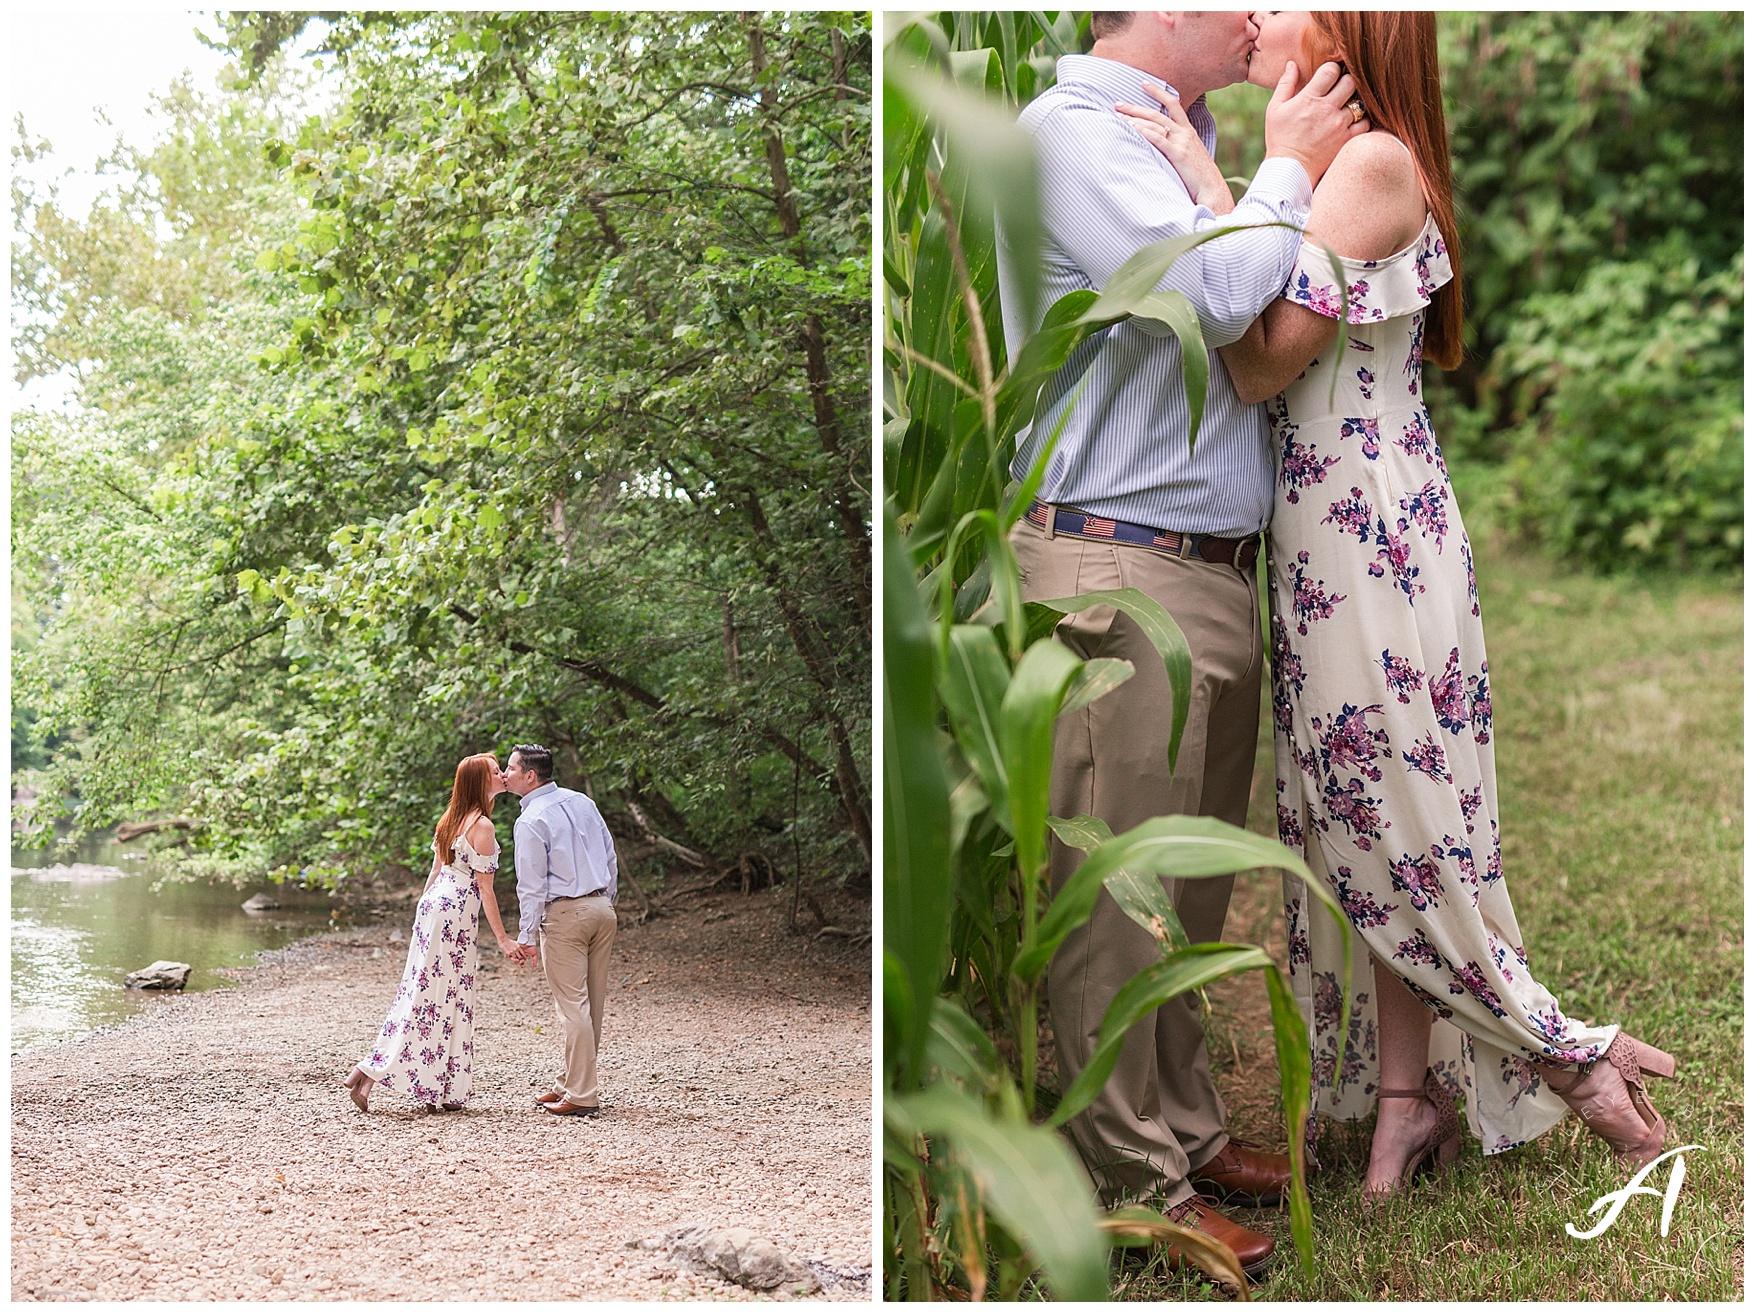 Virginia Wedding and Engagement Photographer || Lynchburg Virginia Wedding || Ashley Eiban Photography || www.ashleyeiban.com